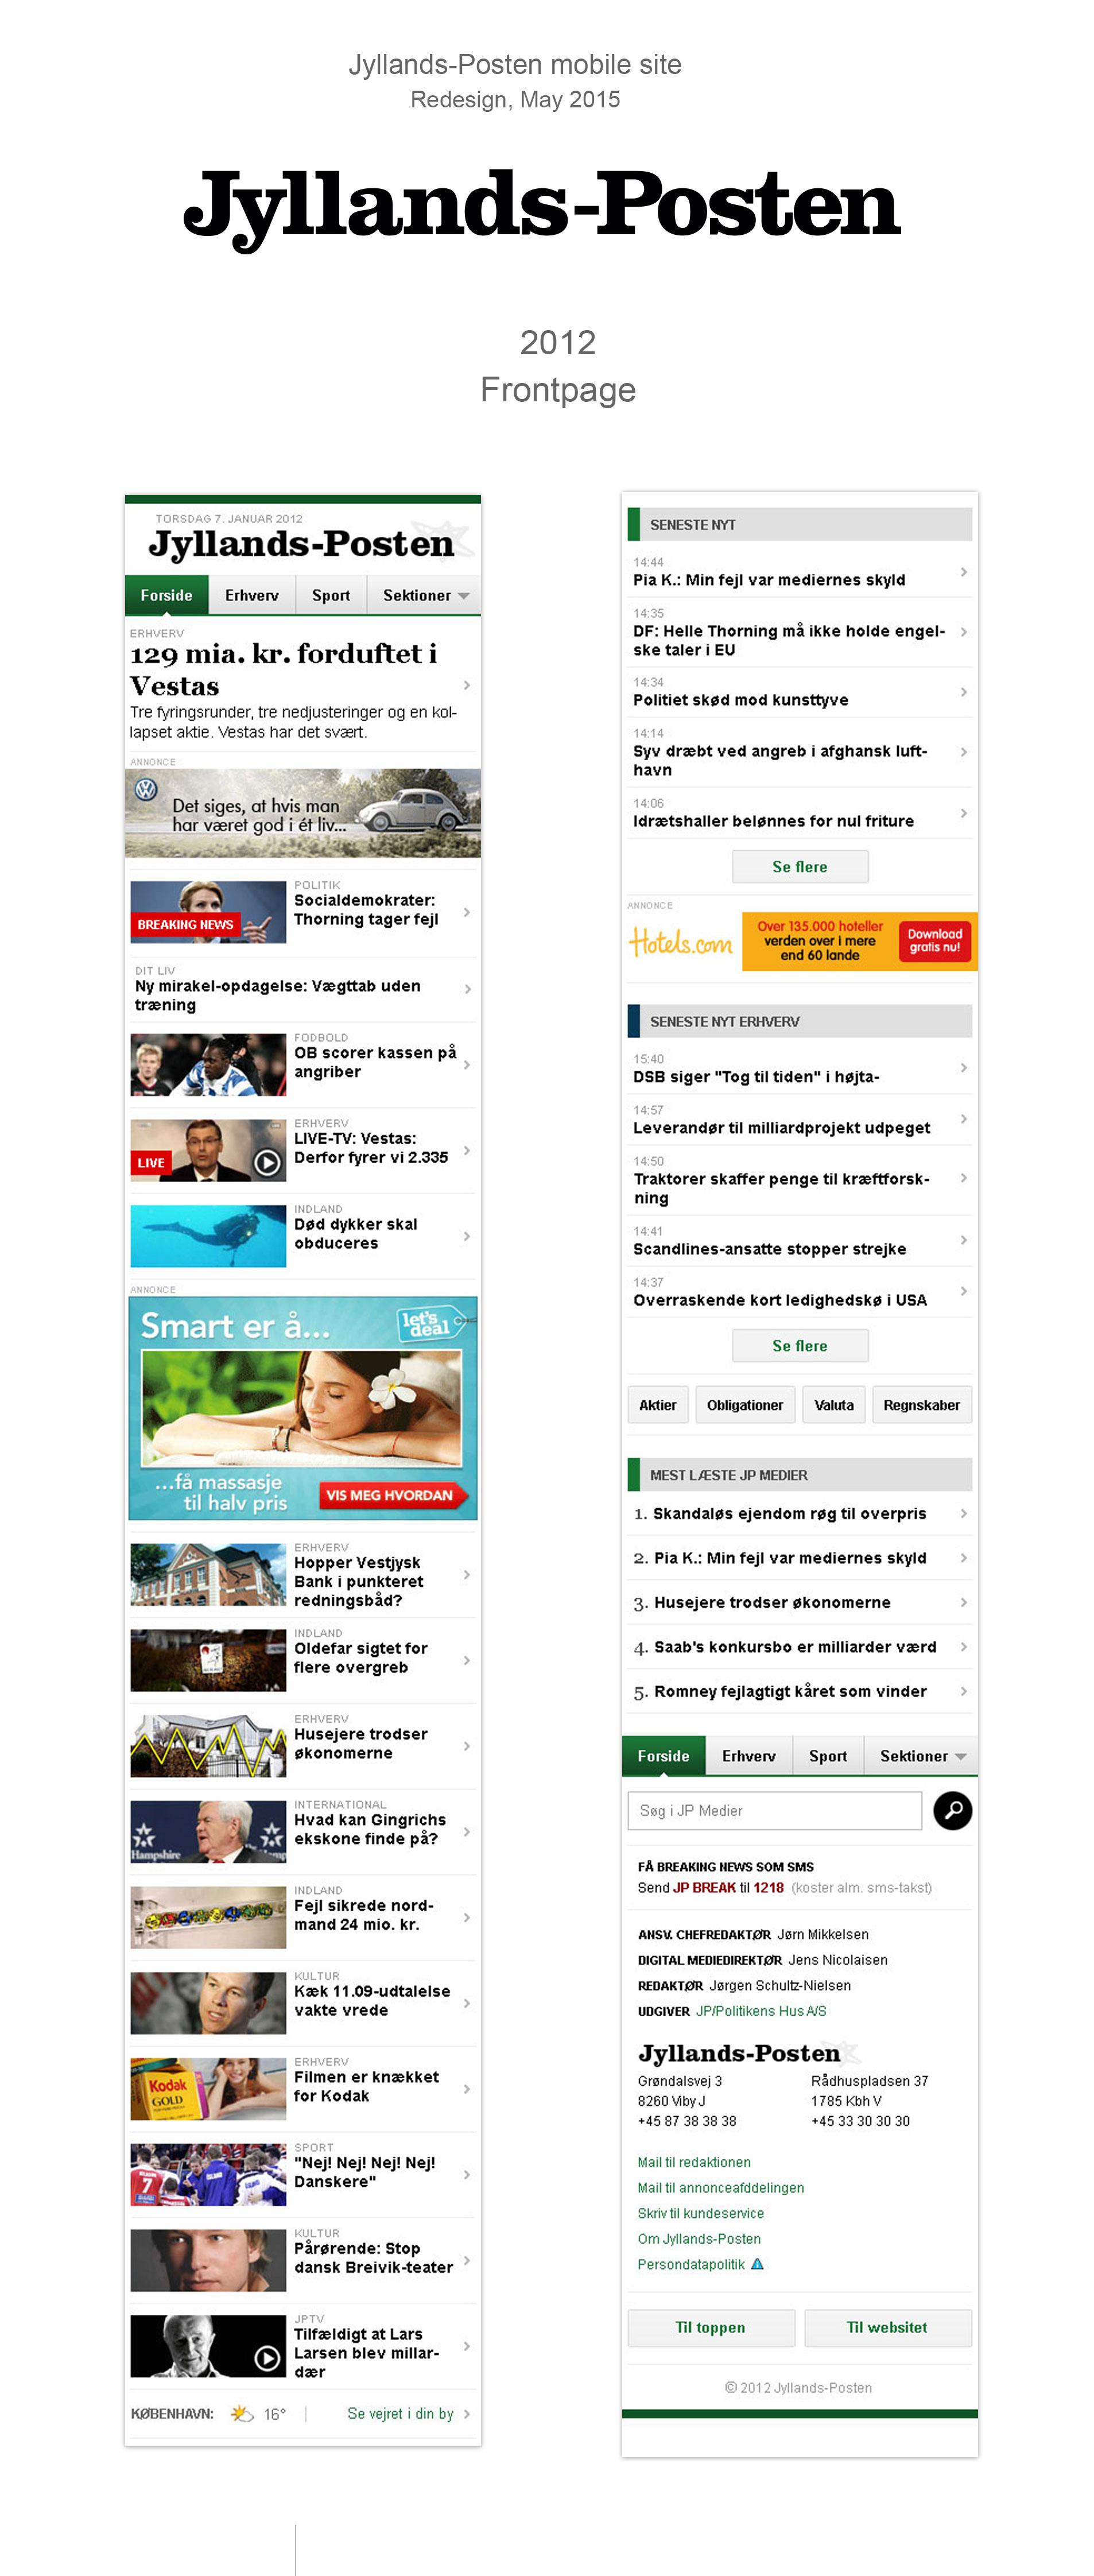 Jyllands-Posten mobile site, redesign